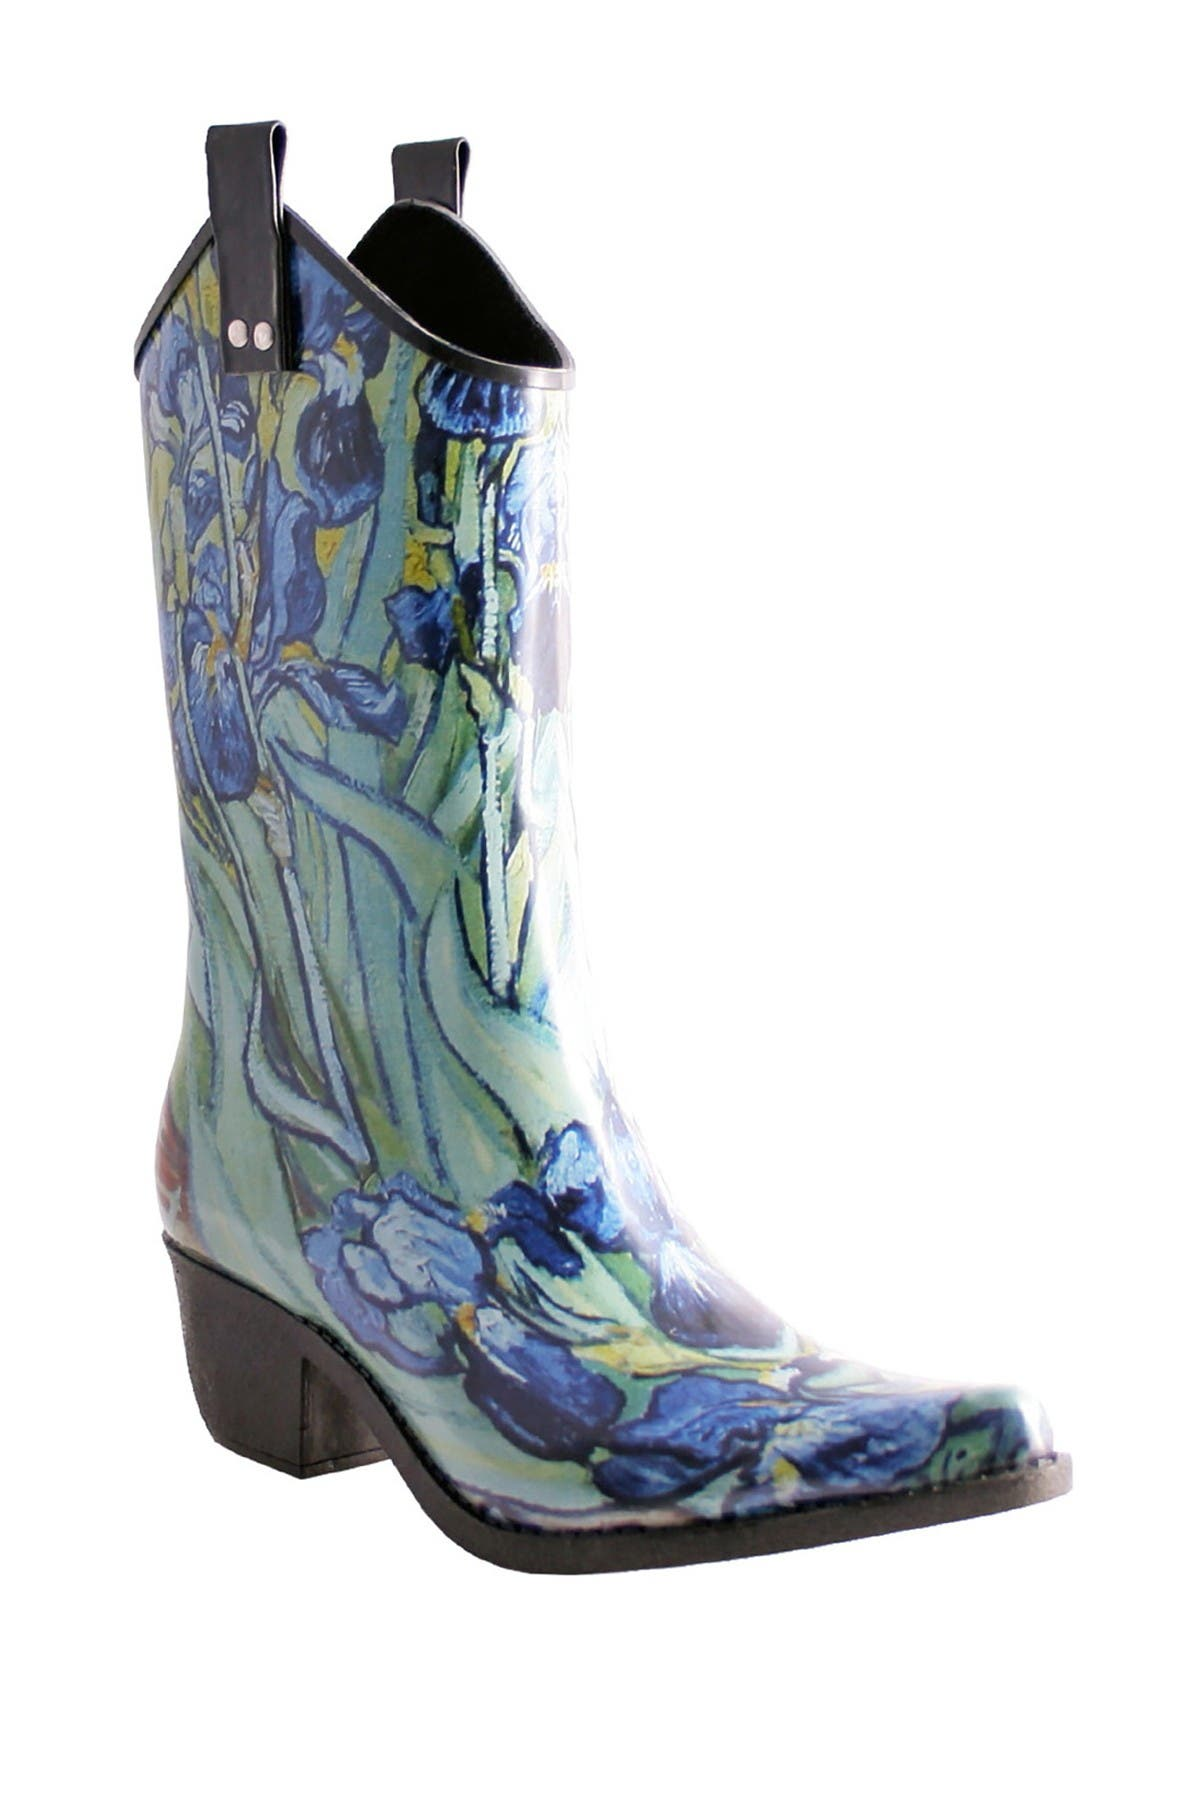 Image of Nomad Footwear Yippy Cowboy Waterproof Rain Boot